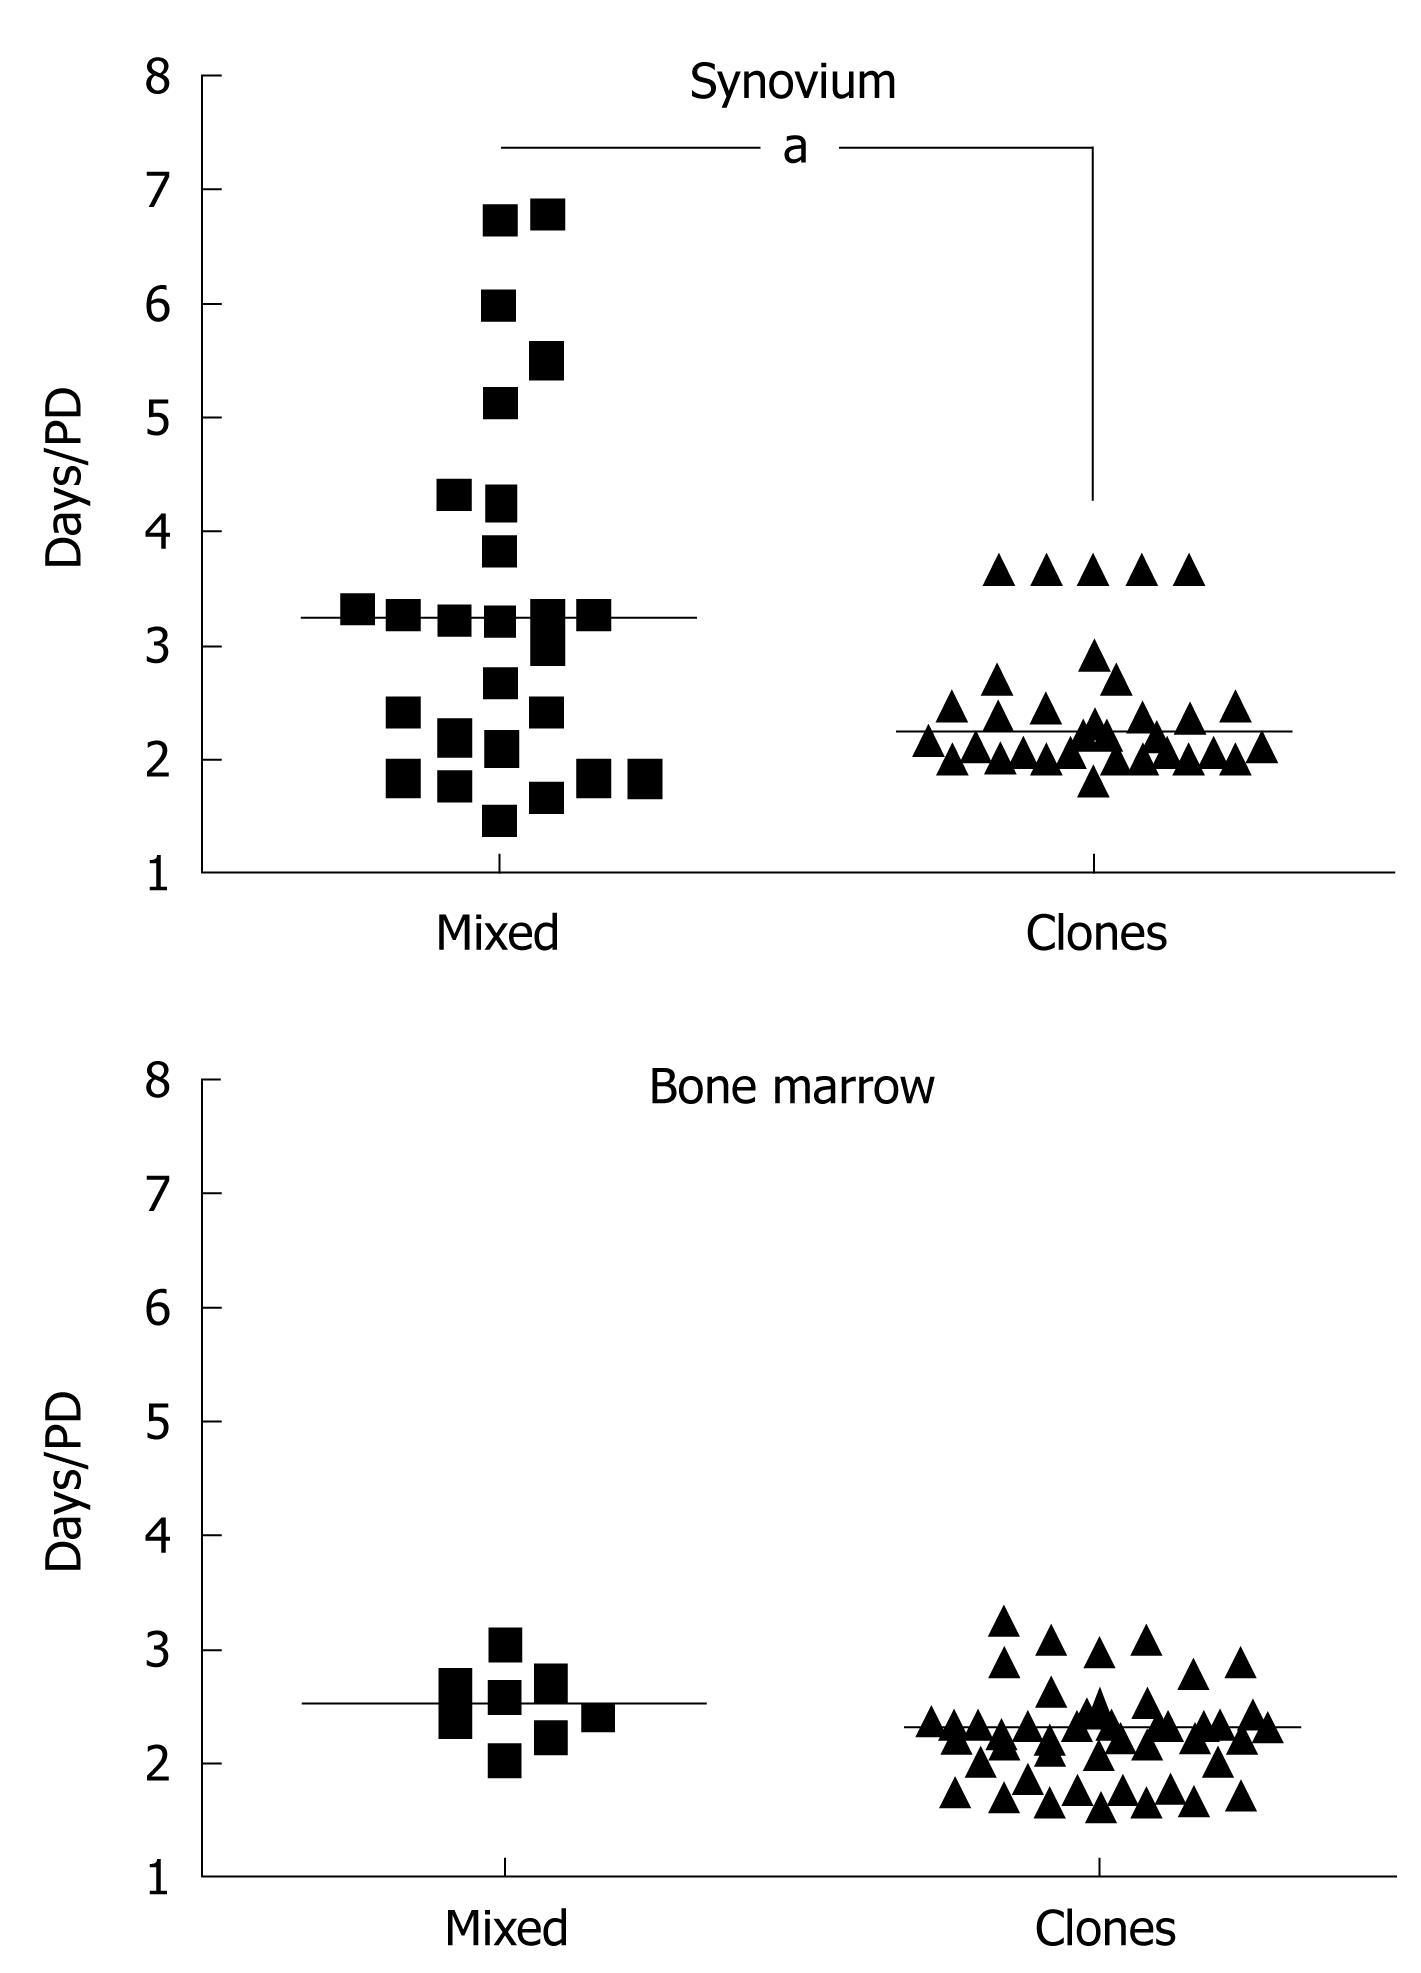 Synovial mesenchymal stem cells in vivo: Potential key